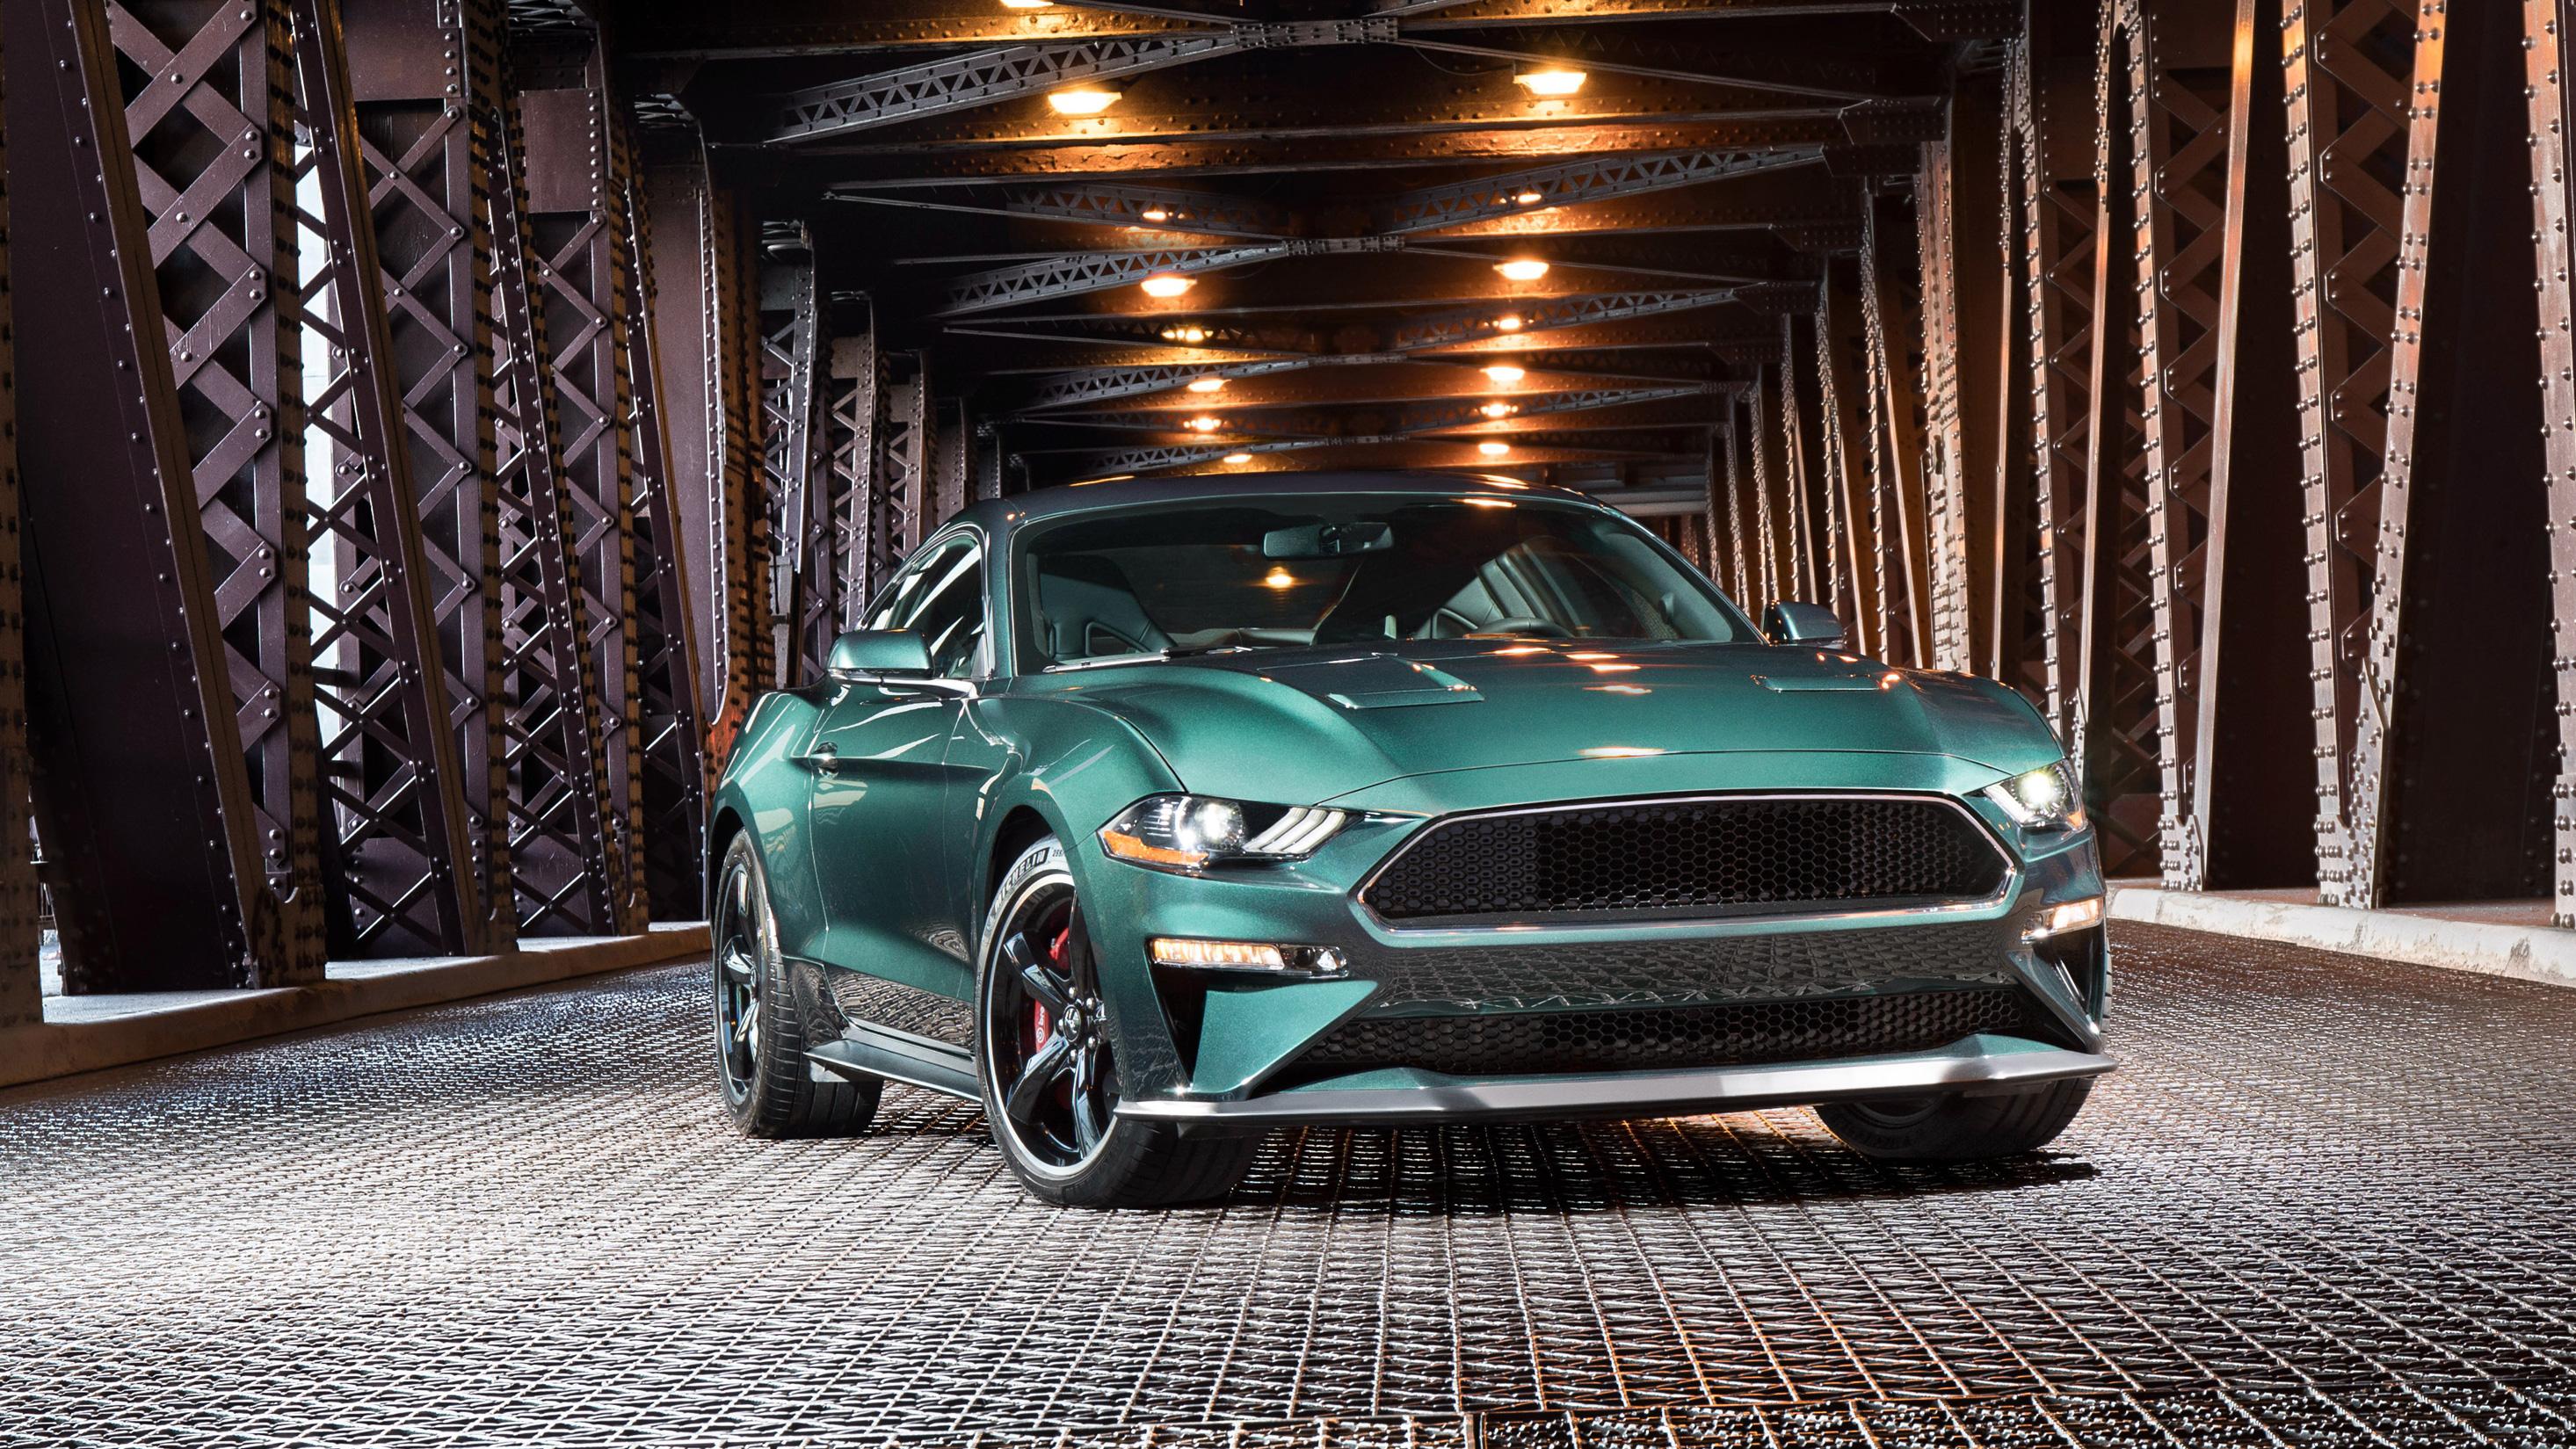 2019 Ford Mustang Bullitt Hd Cars 4k Wallpapers Images